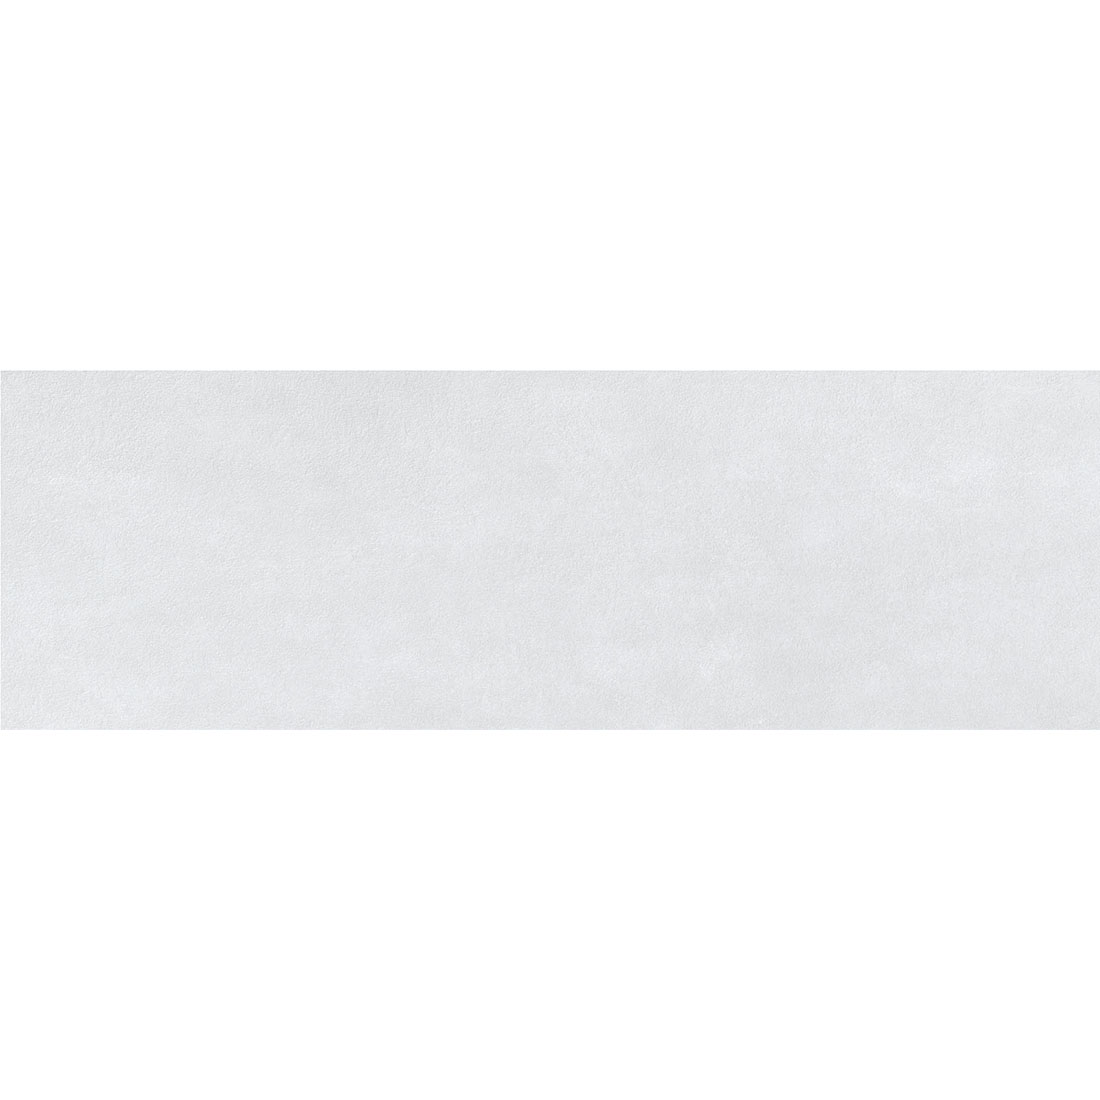 Neutral 40x120 Blanco Matt